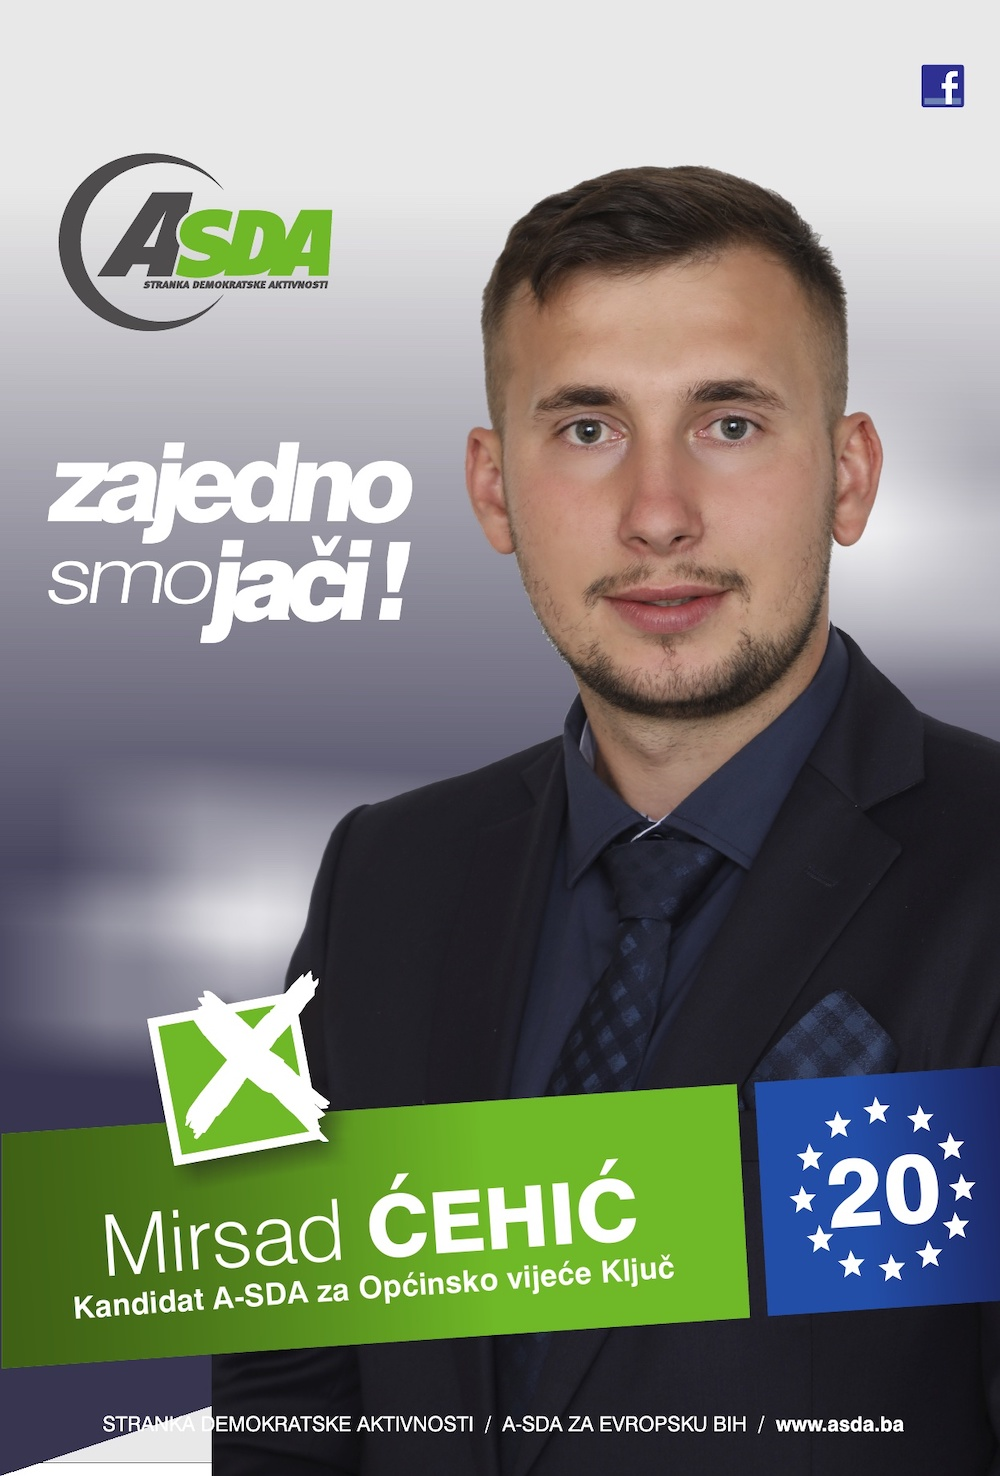 Mirsad Ćehić